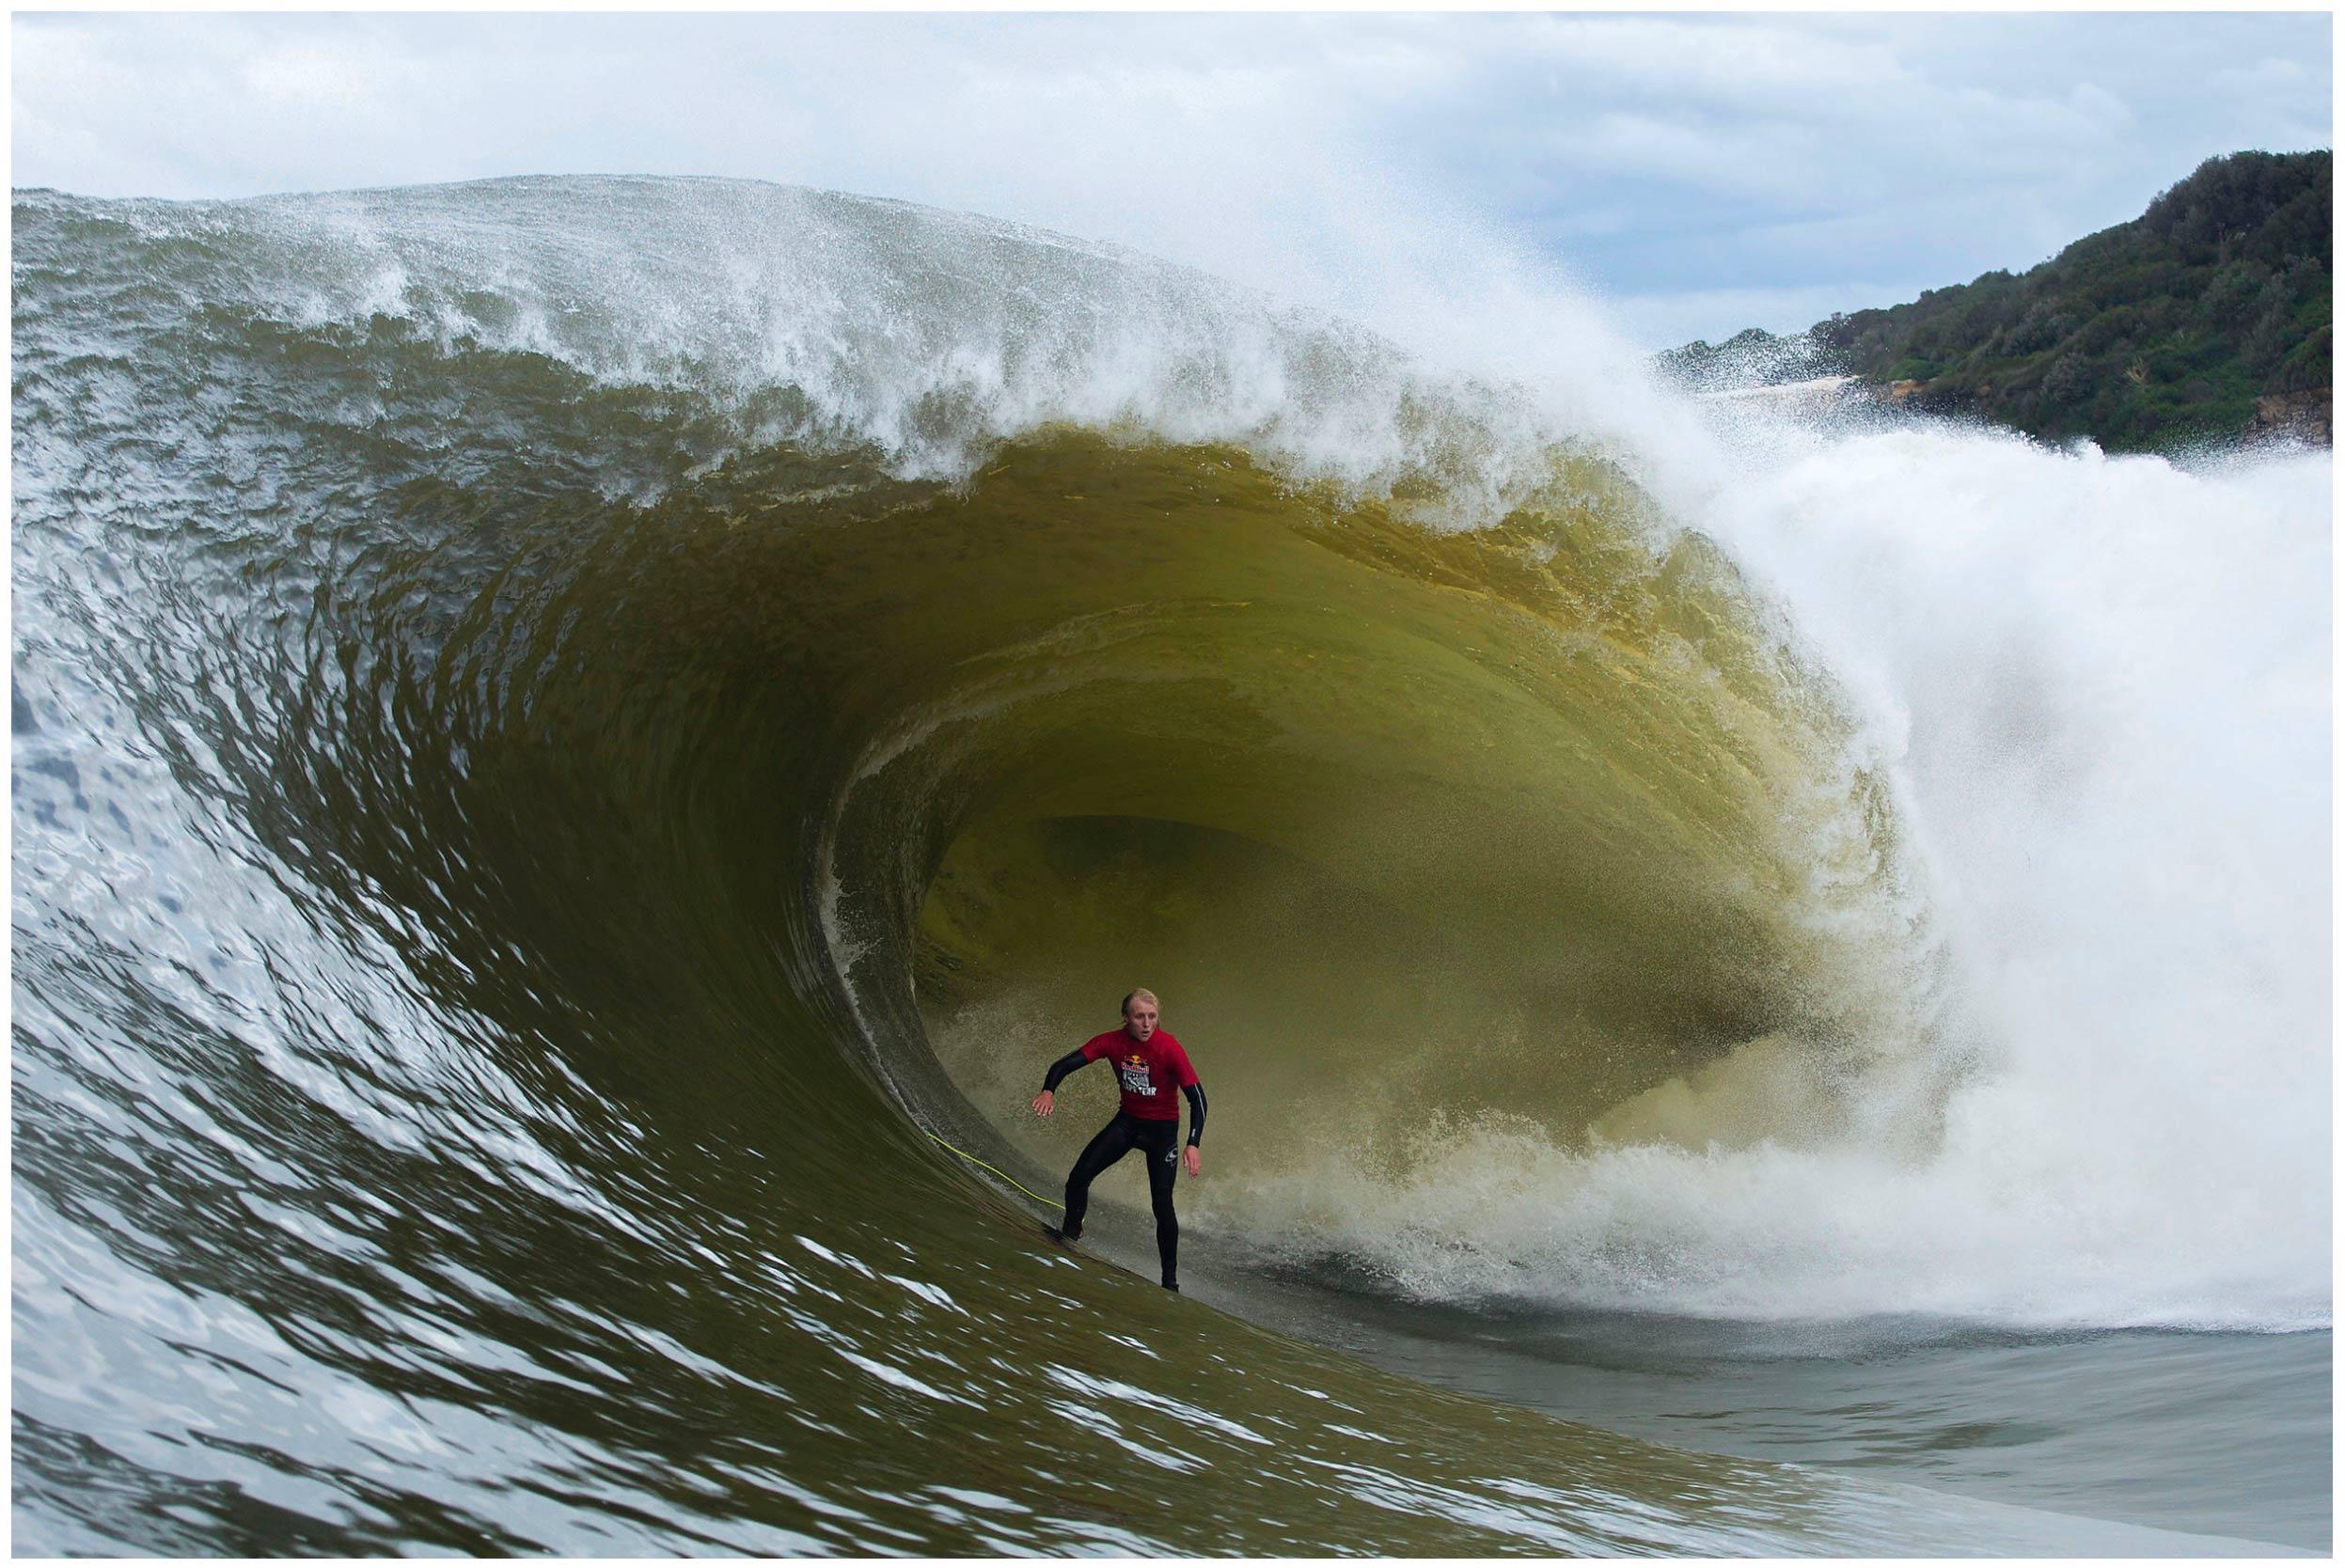 rodd-owen-surf-photography-for-sale-owenphoto-268.jpg